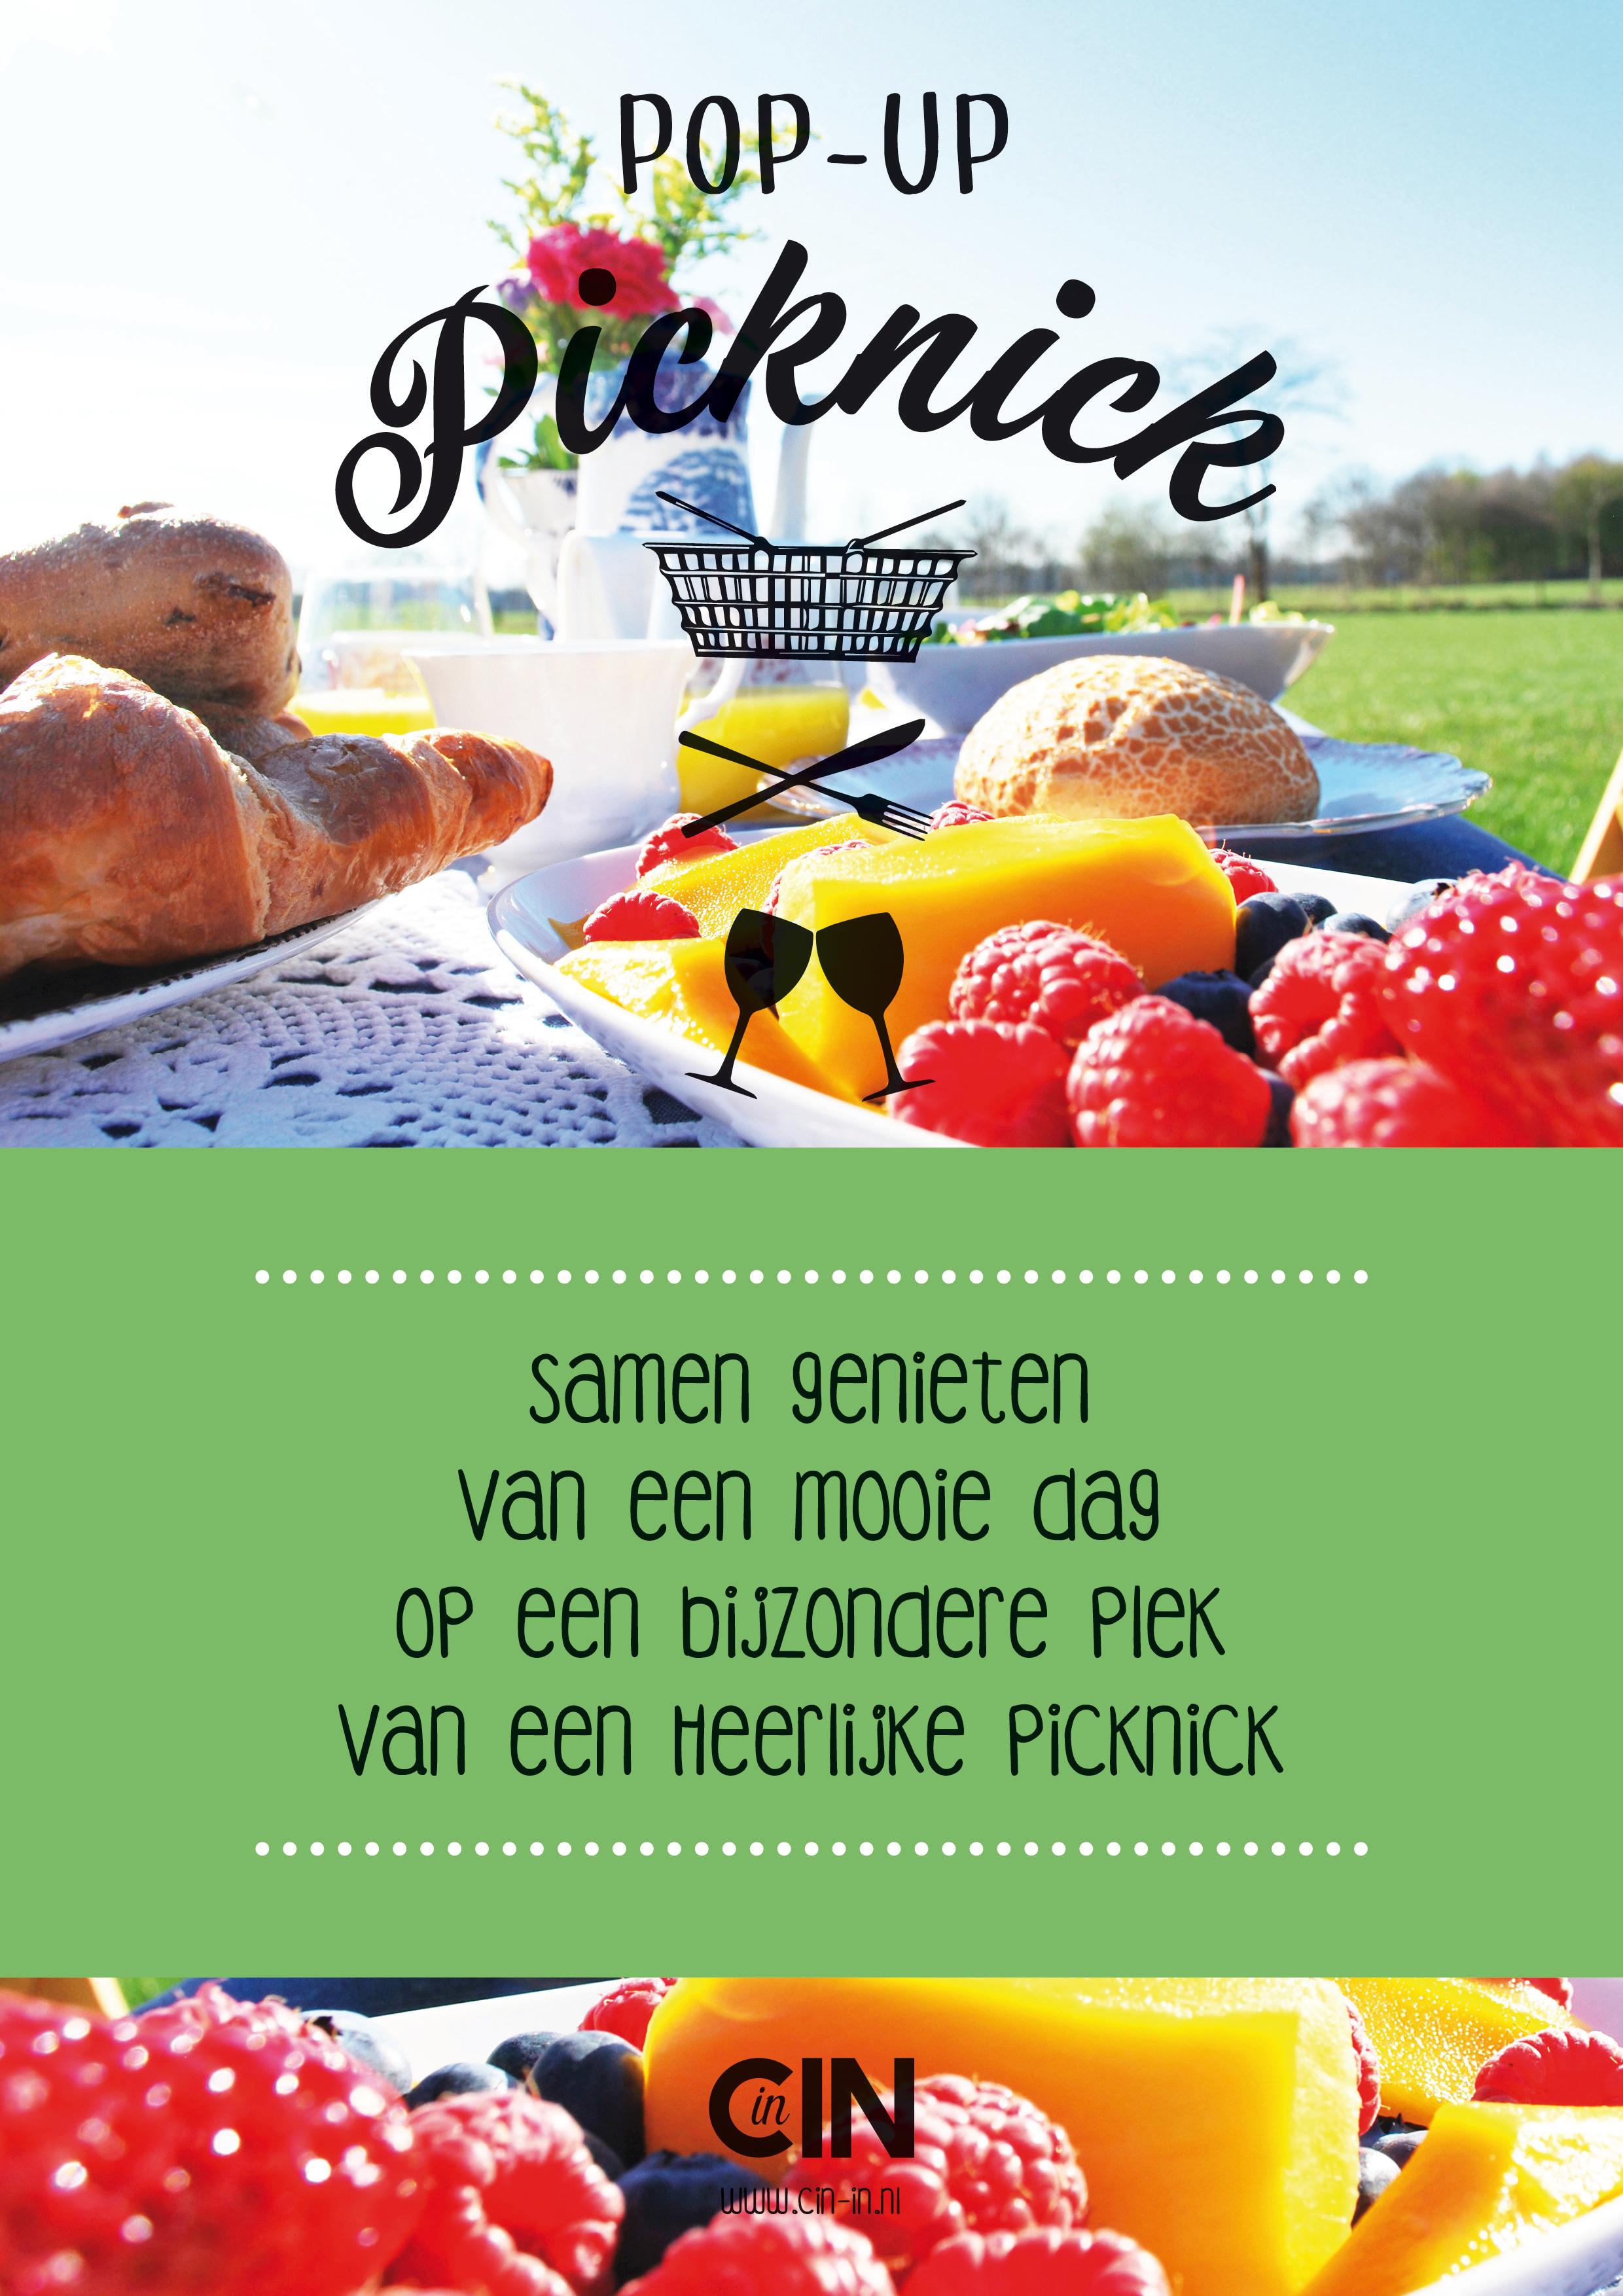 Poster pop-up-picknick